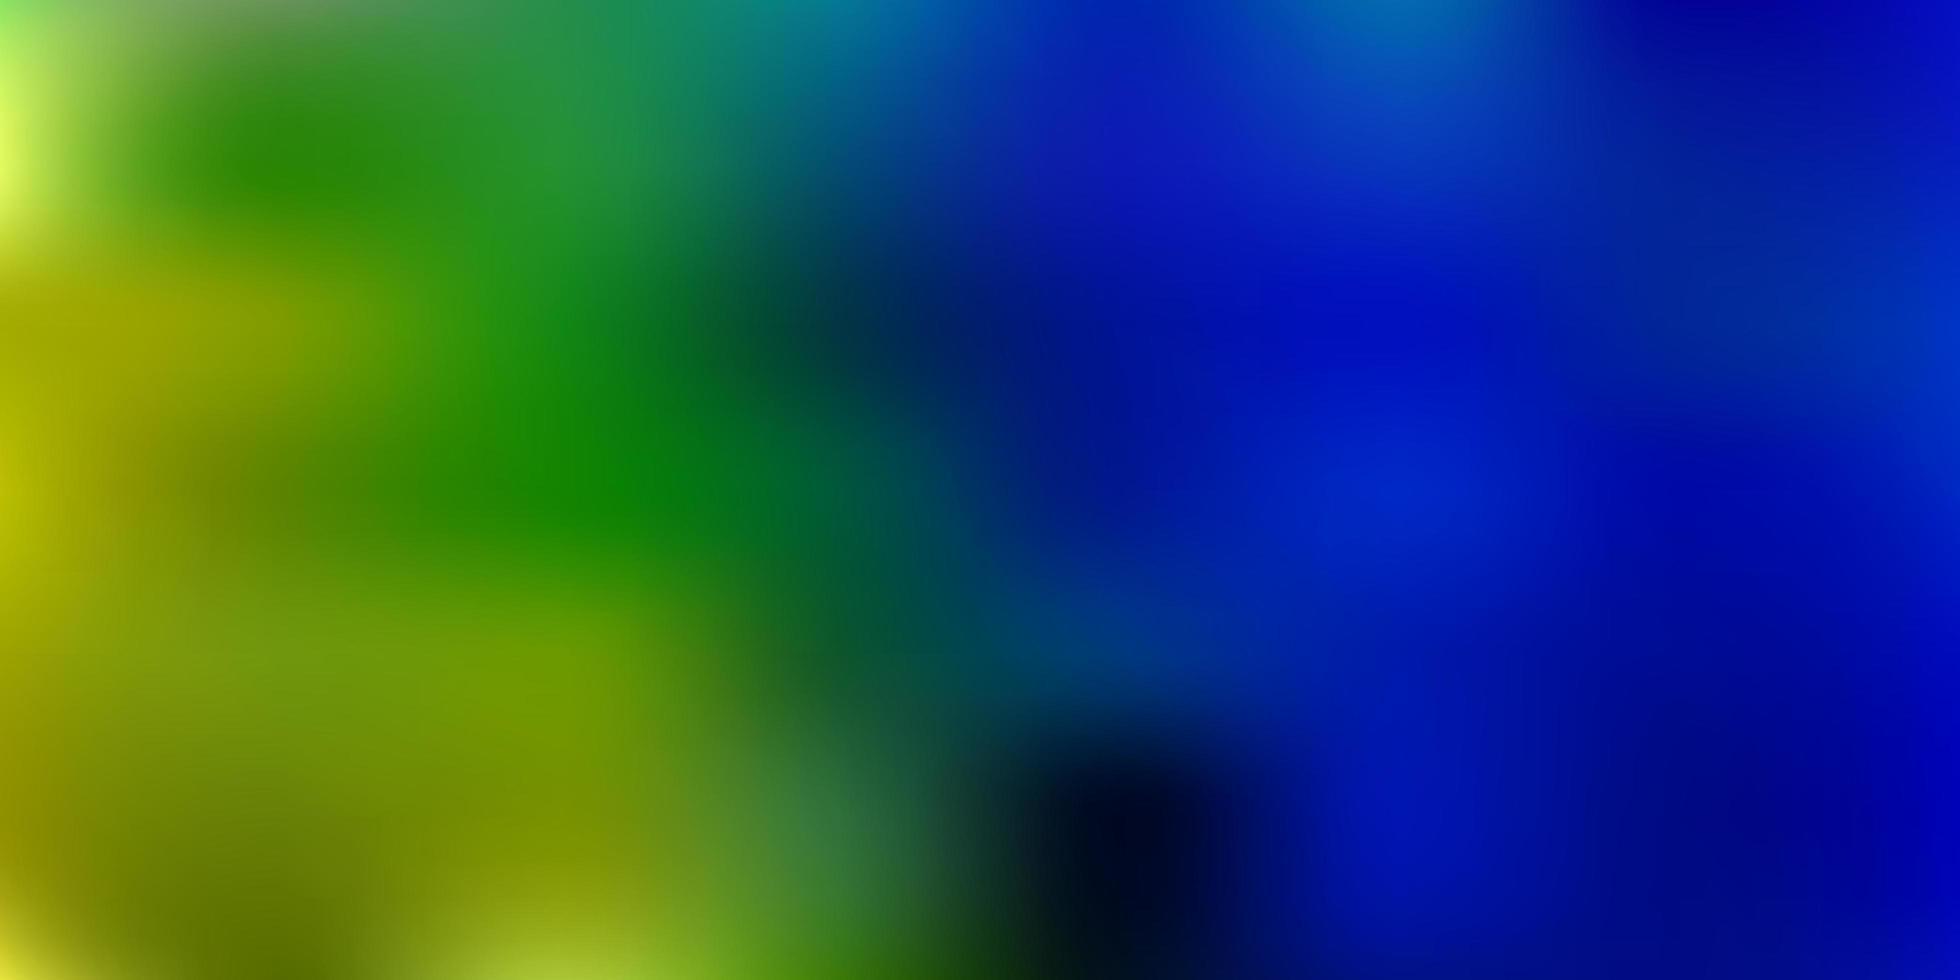 hellblaue, grüne Vektorgradienten-Unschärfetextur. vektor